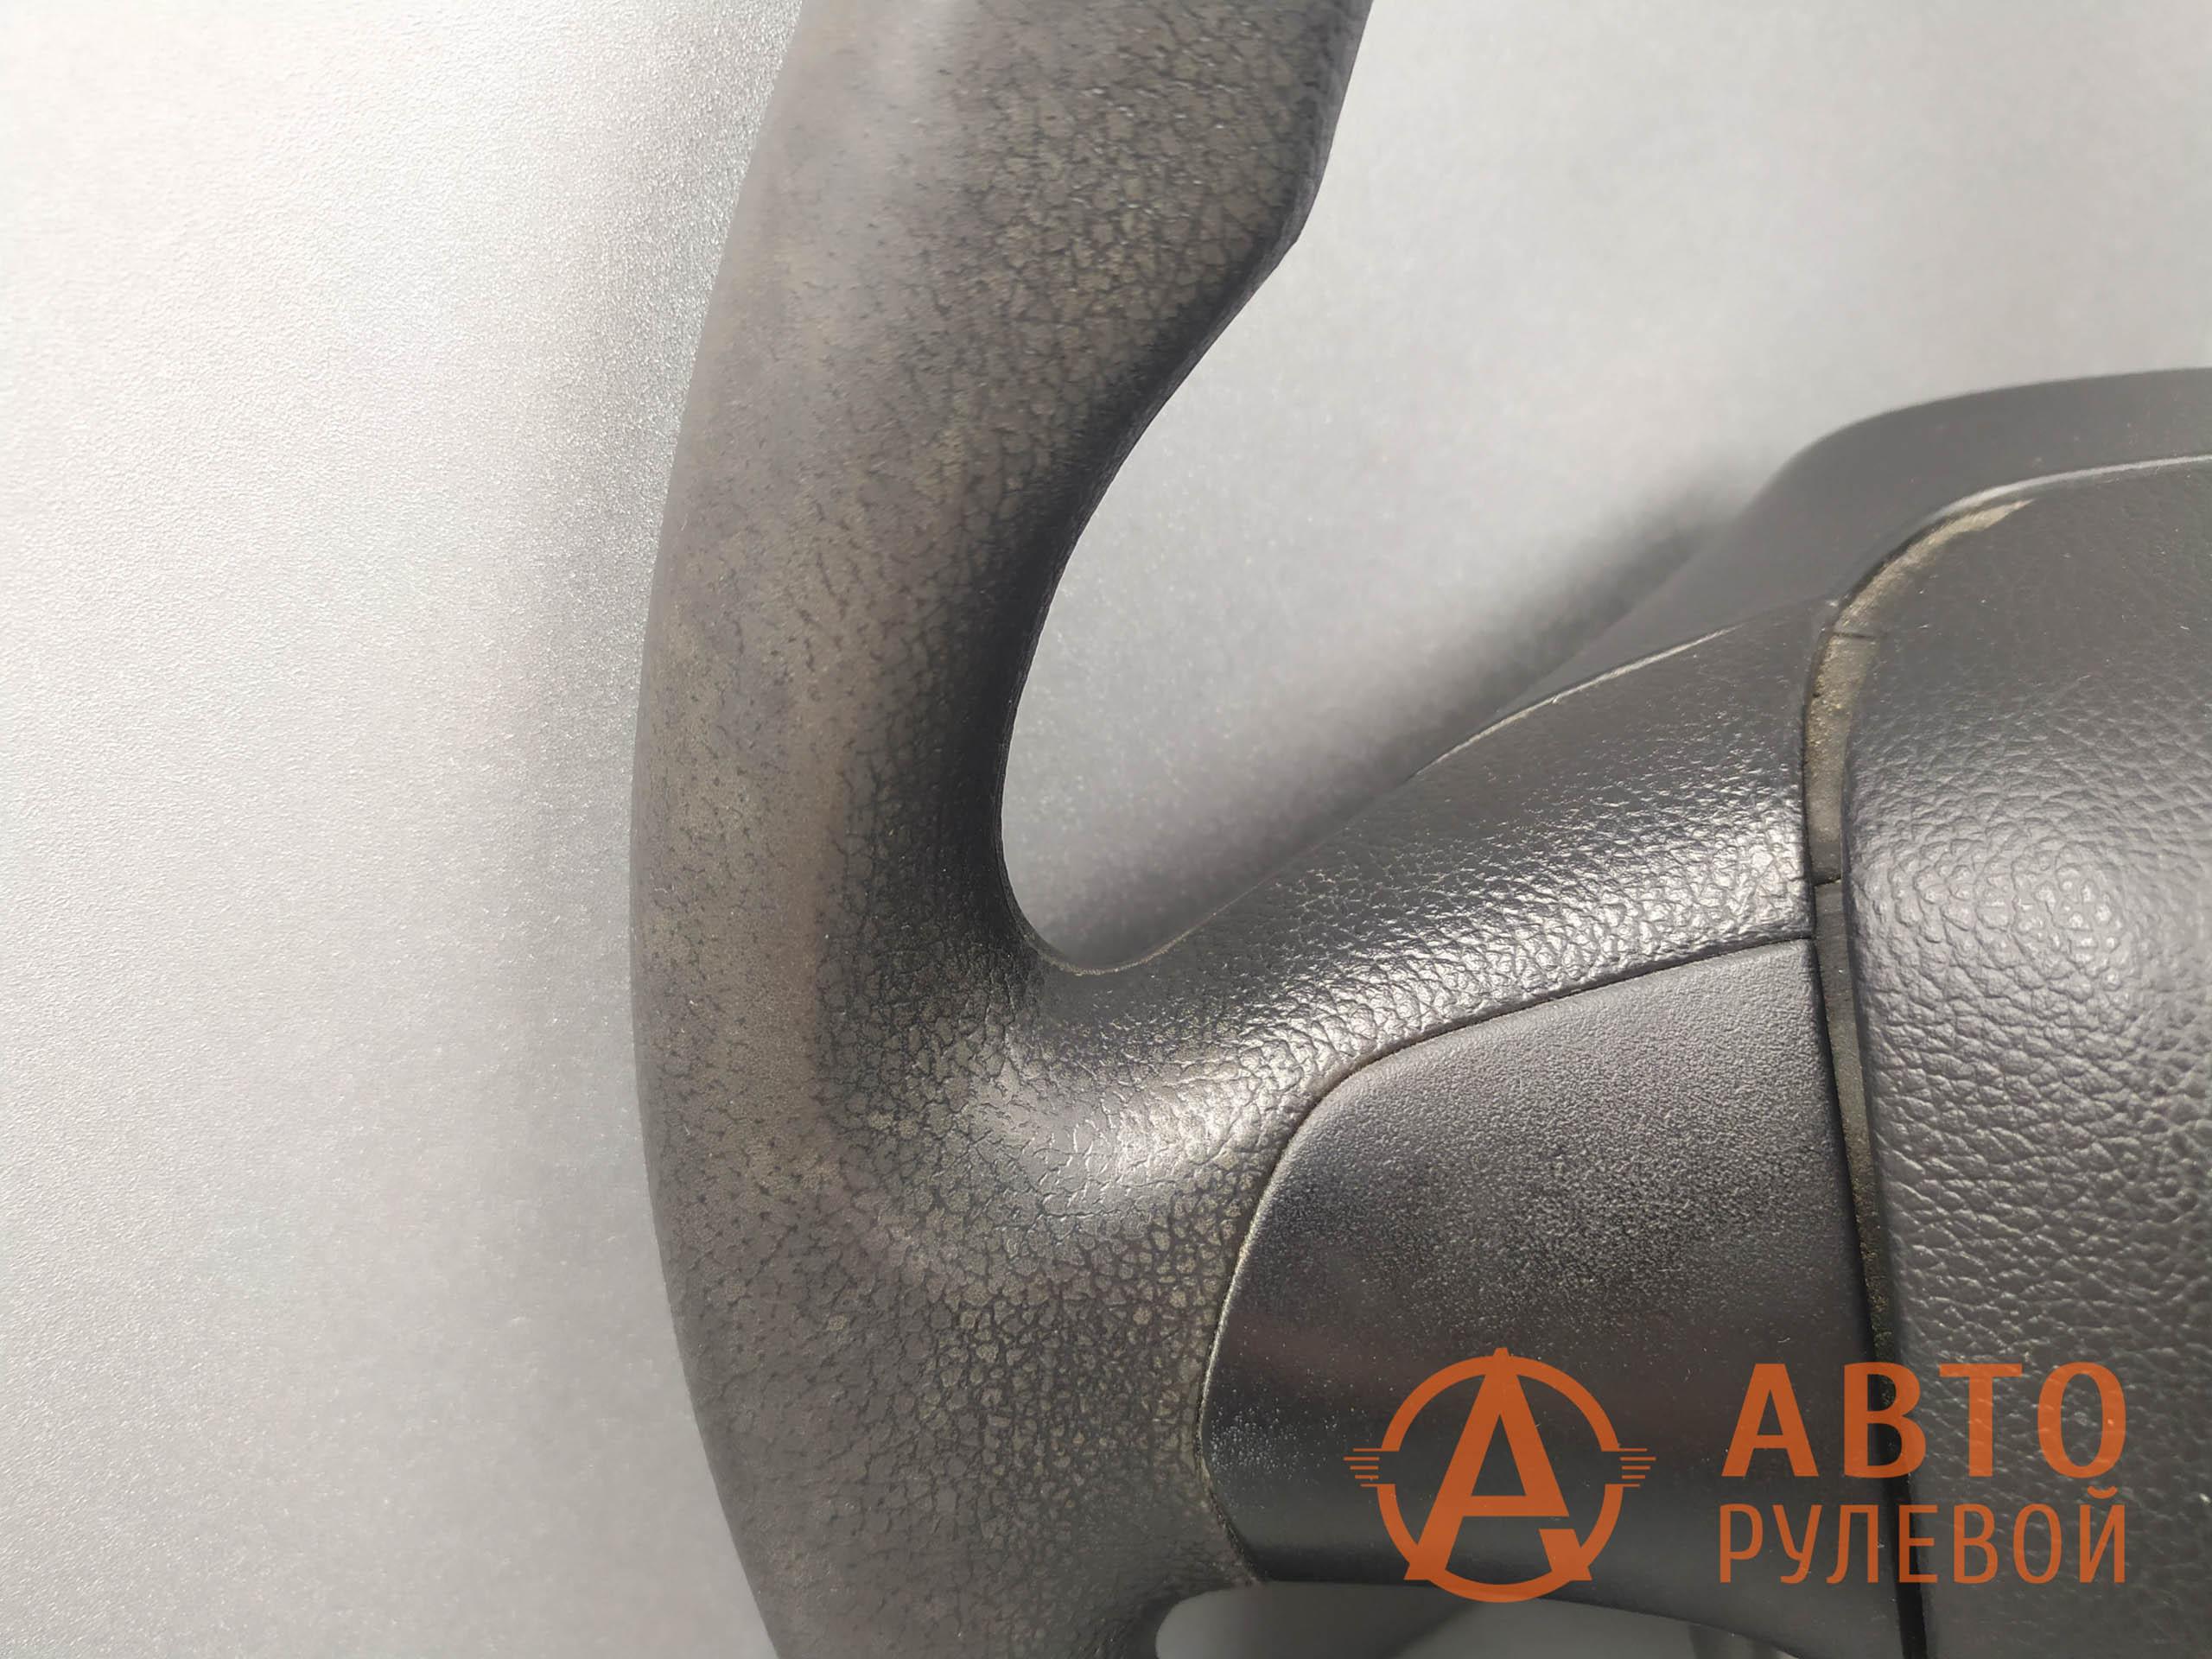 Руль Kia Rio 3 поколение 2013 до перетяжки - 3